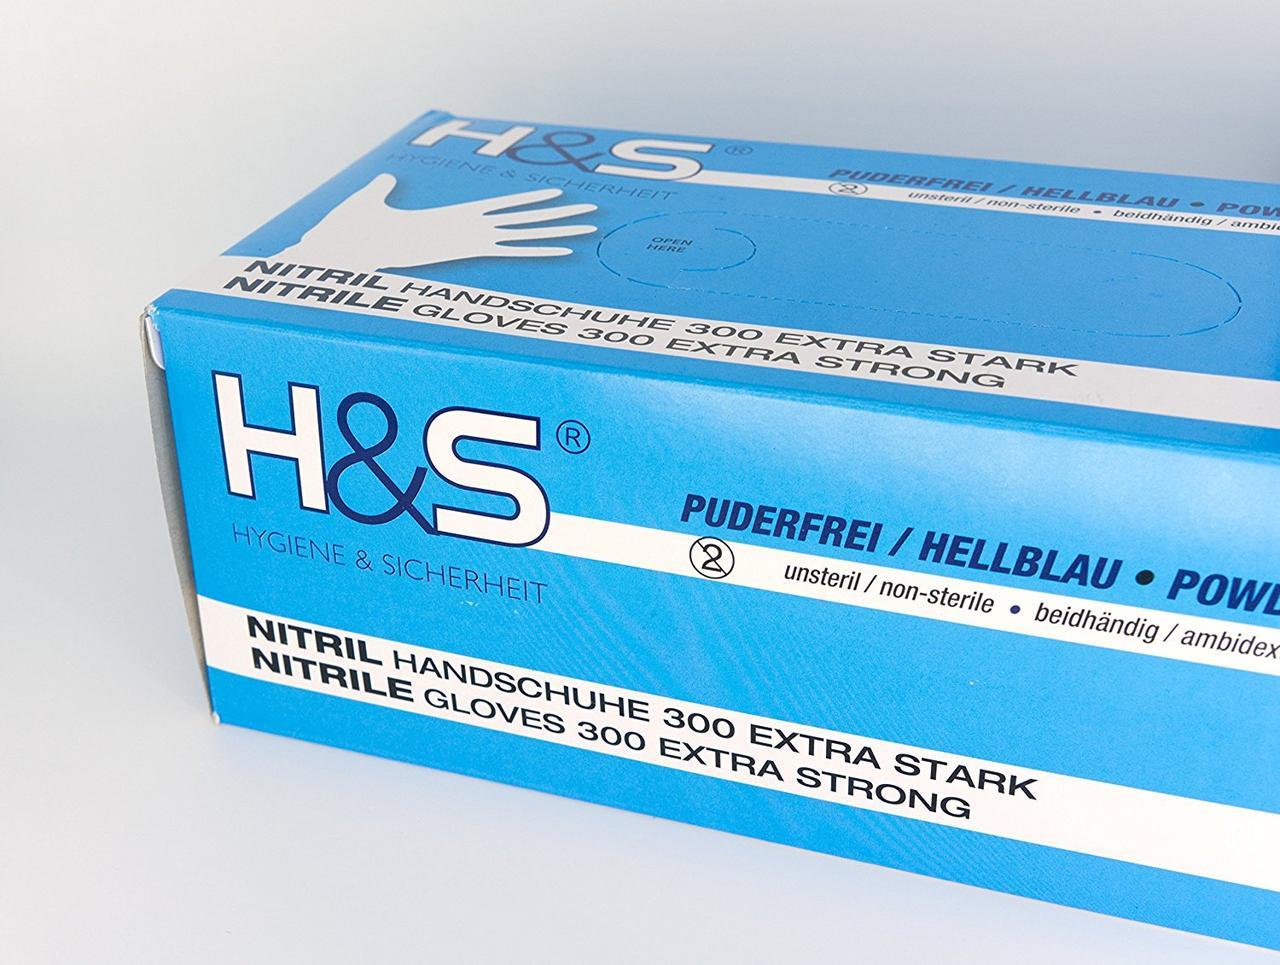 Одноразовые перчатки - ISC Hygiene & Safety